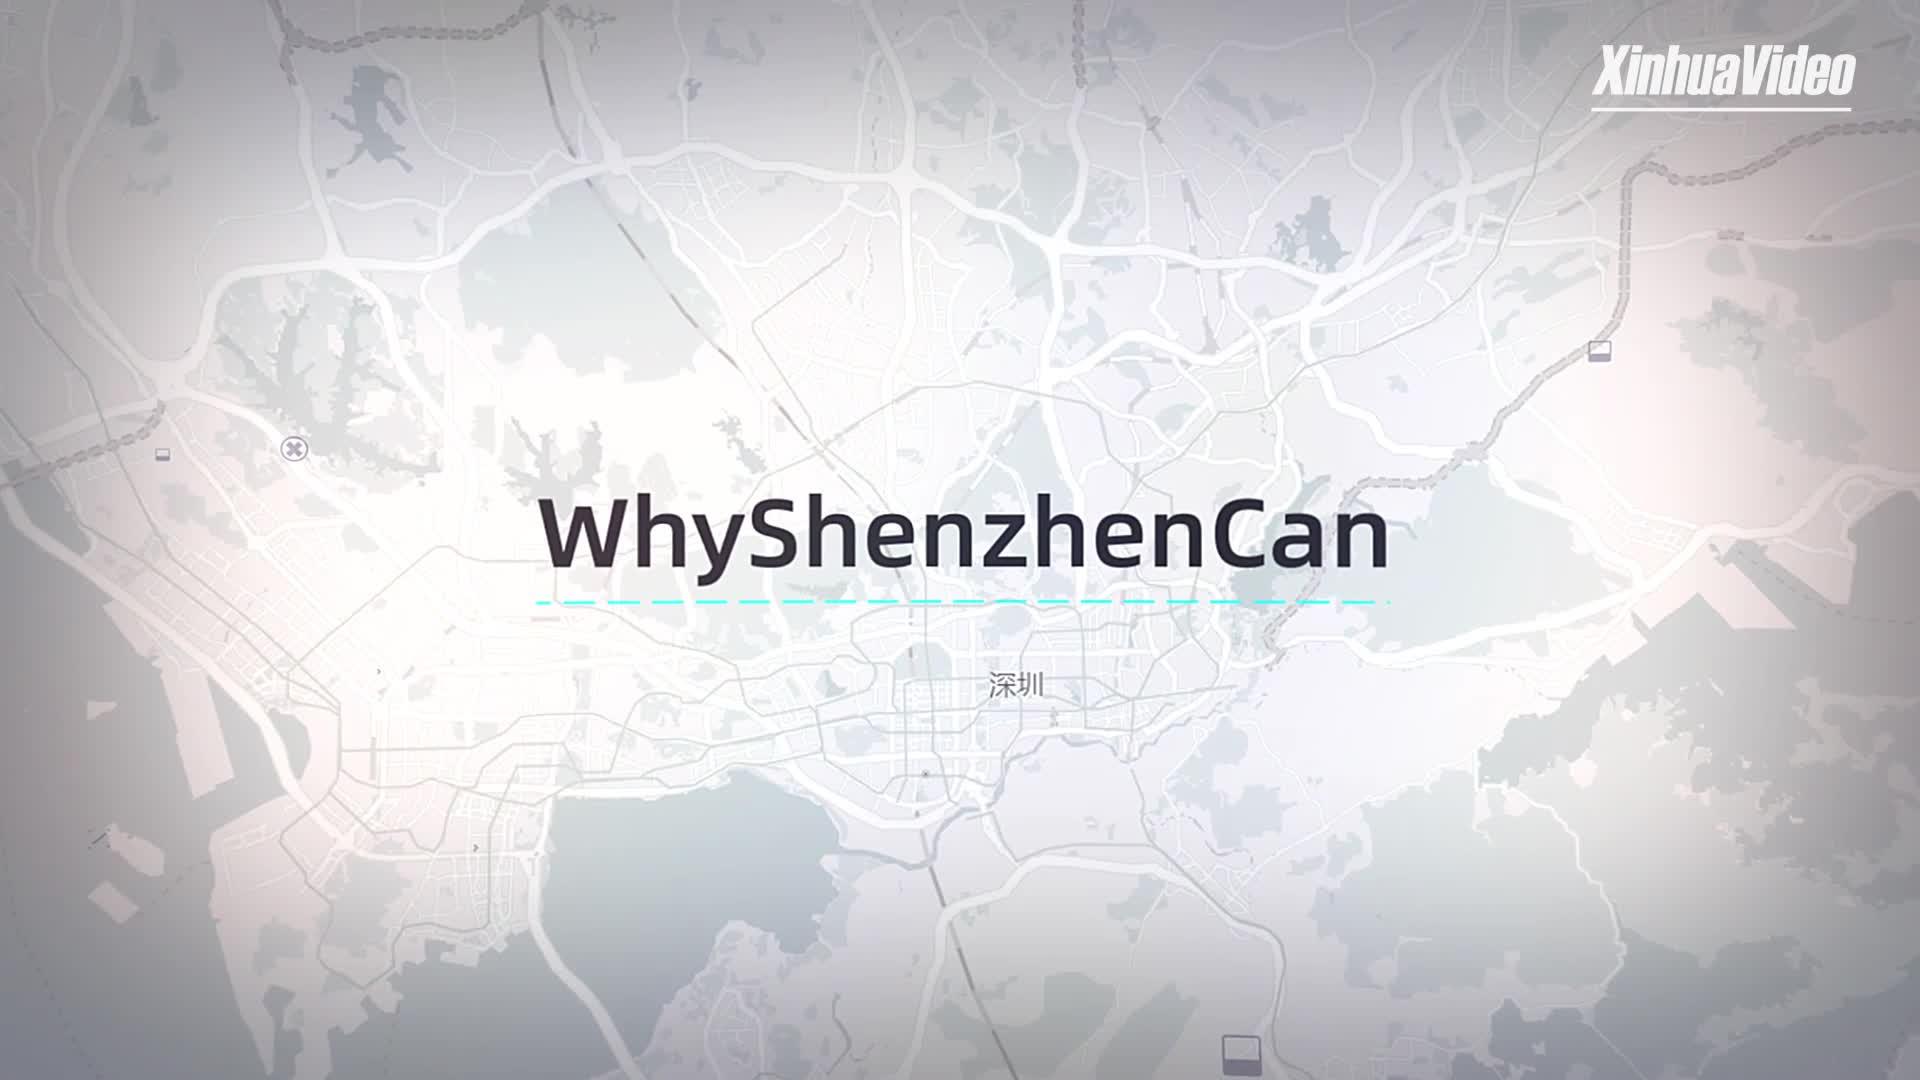 Shenzhen: miracle starts anew